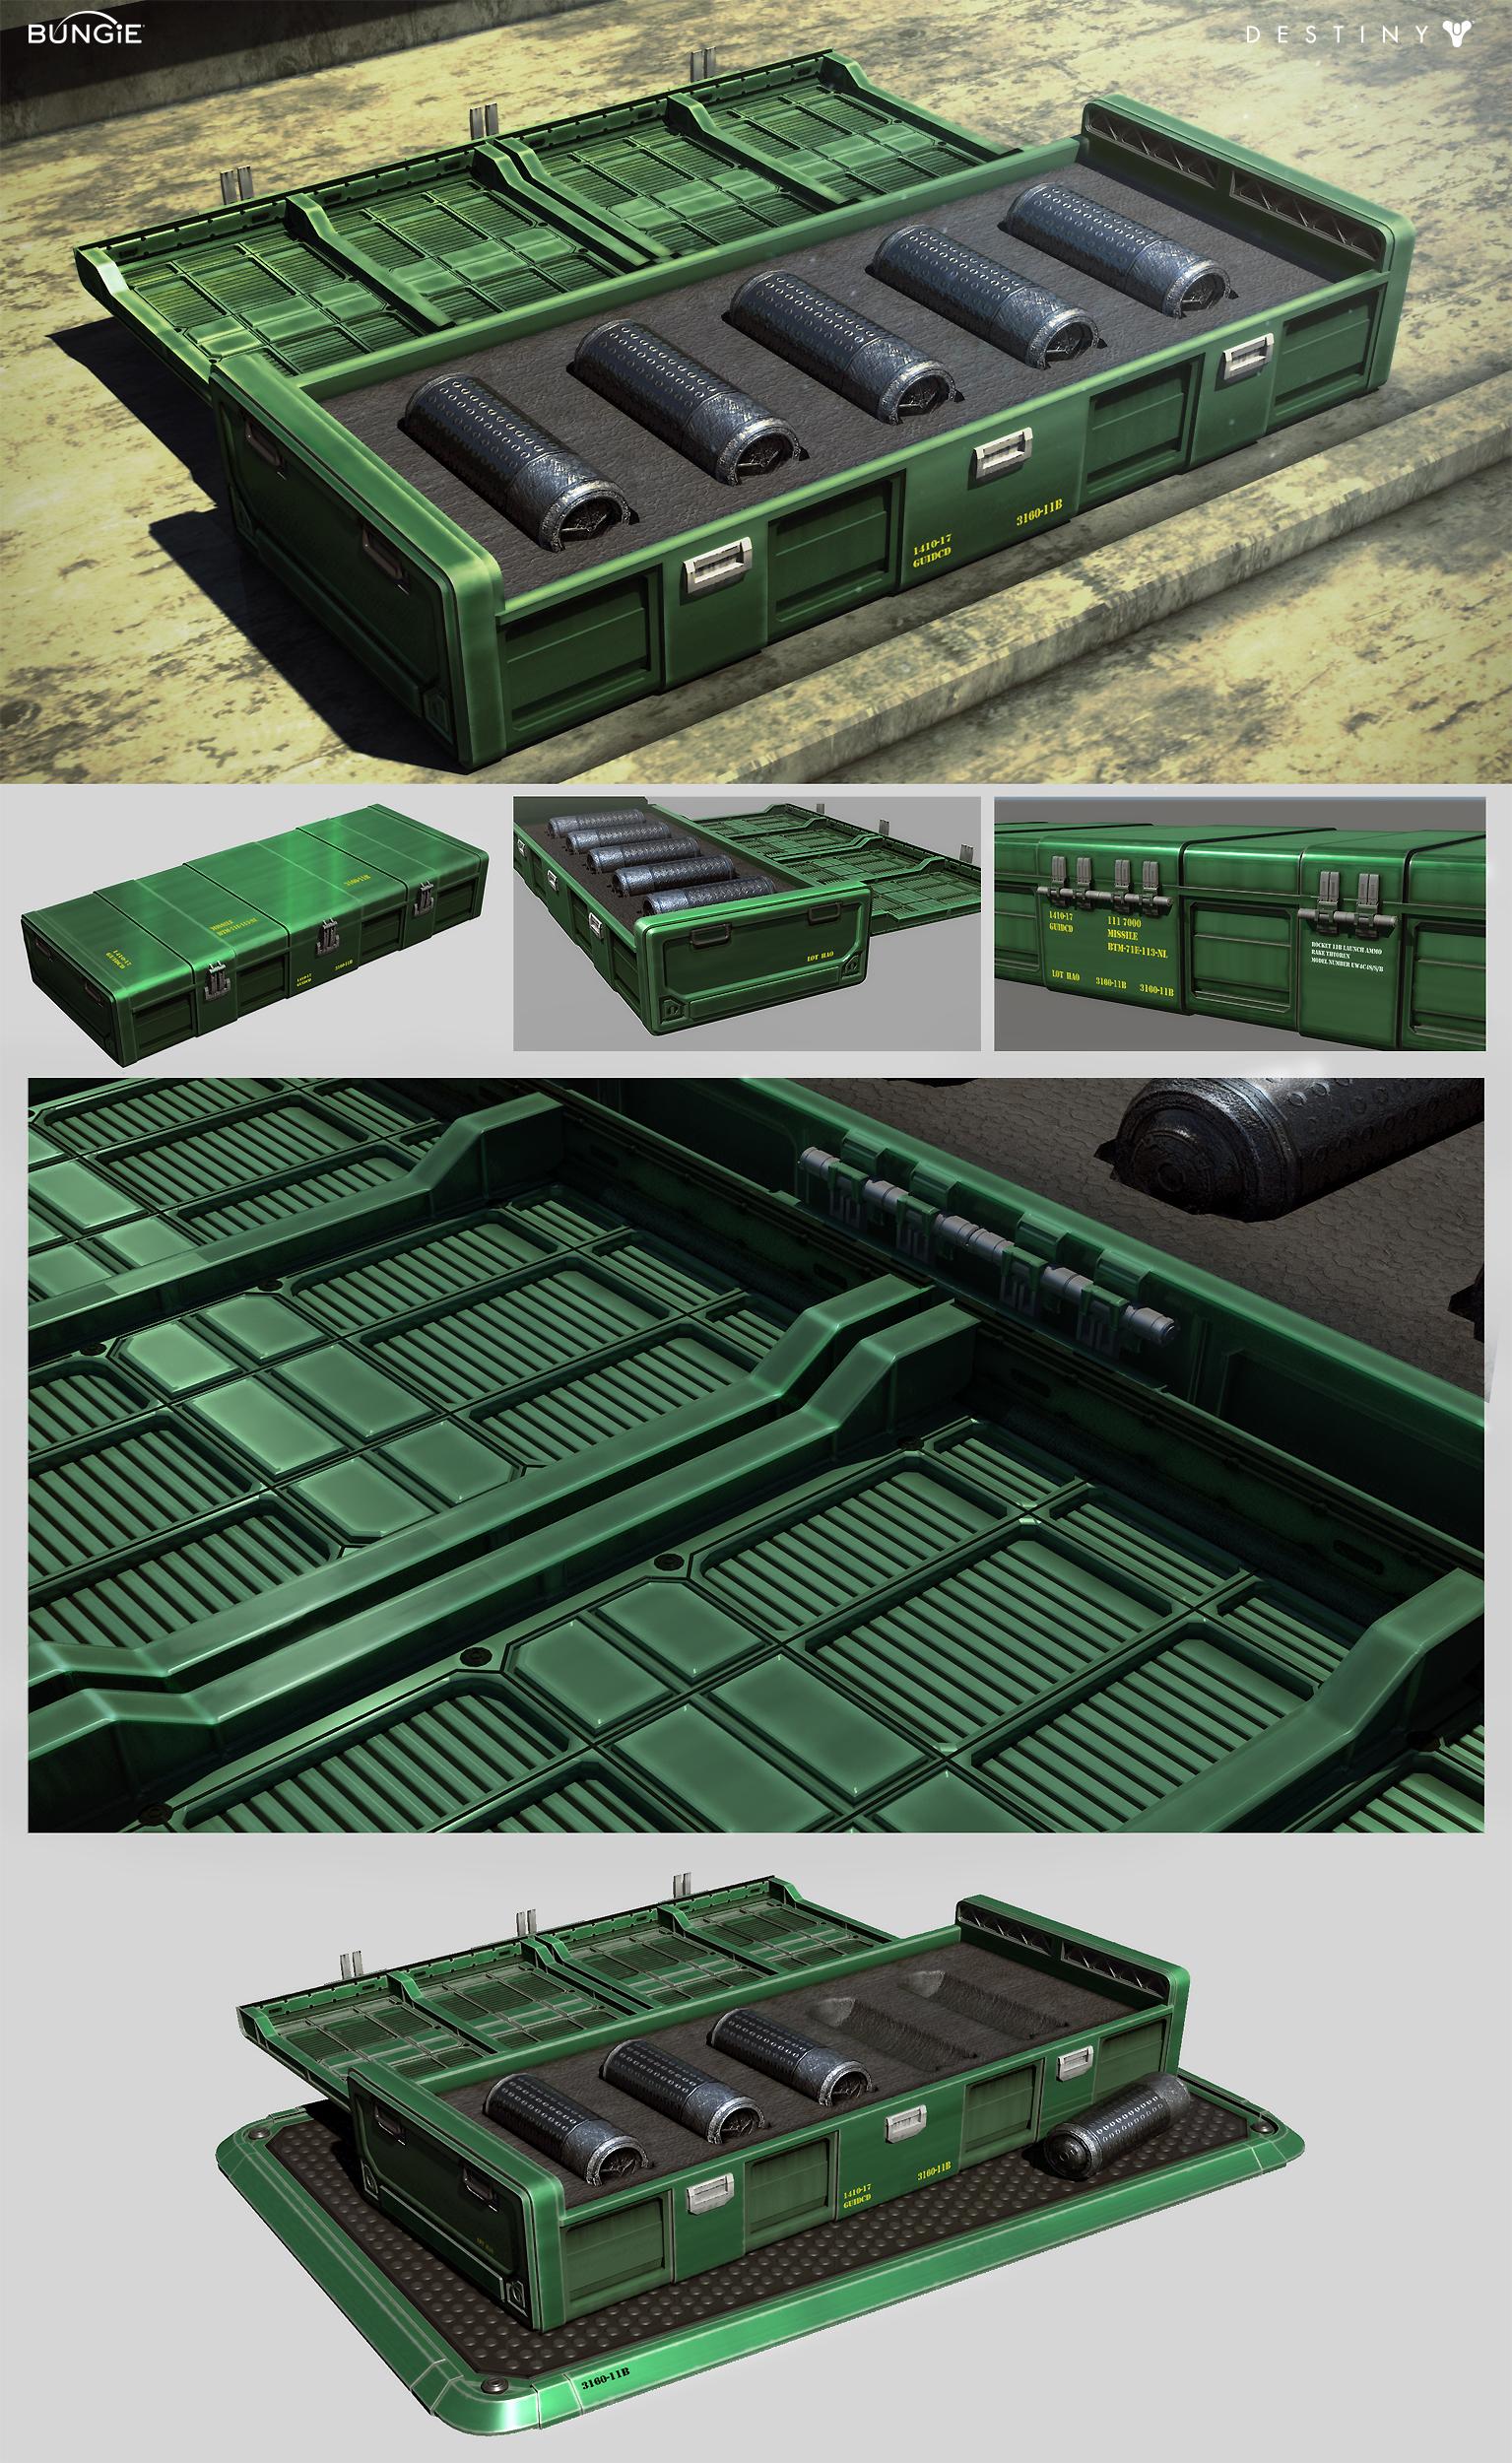 fc_crate_platform_ammo_crate.jpg